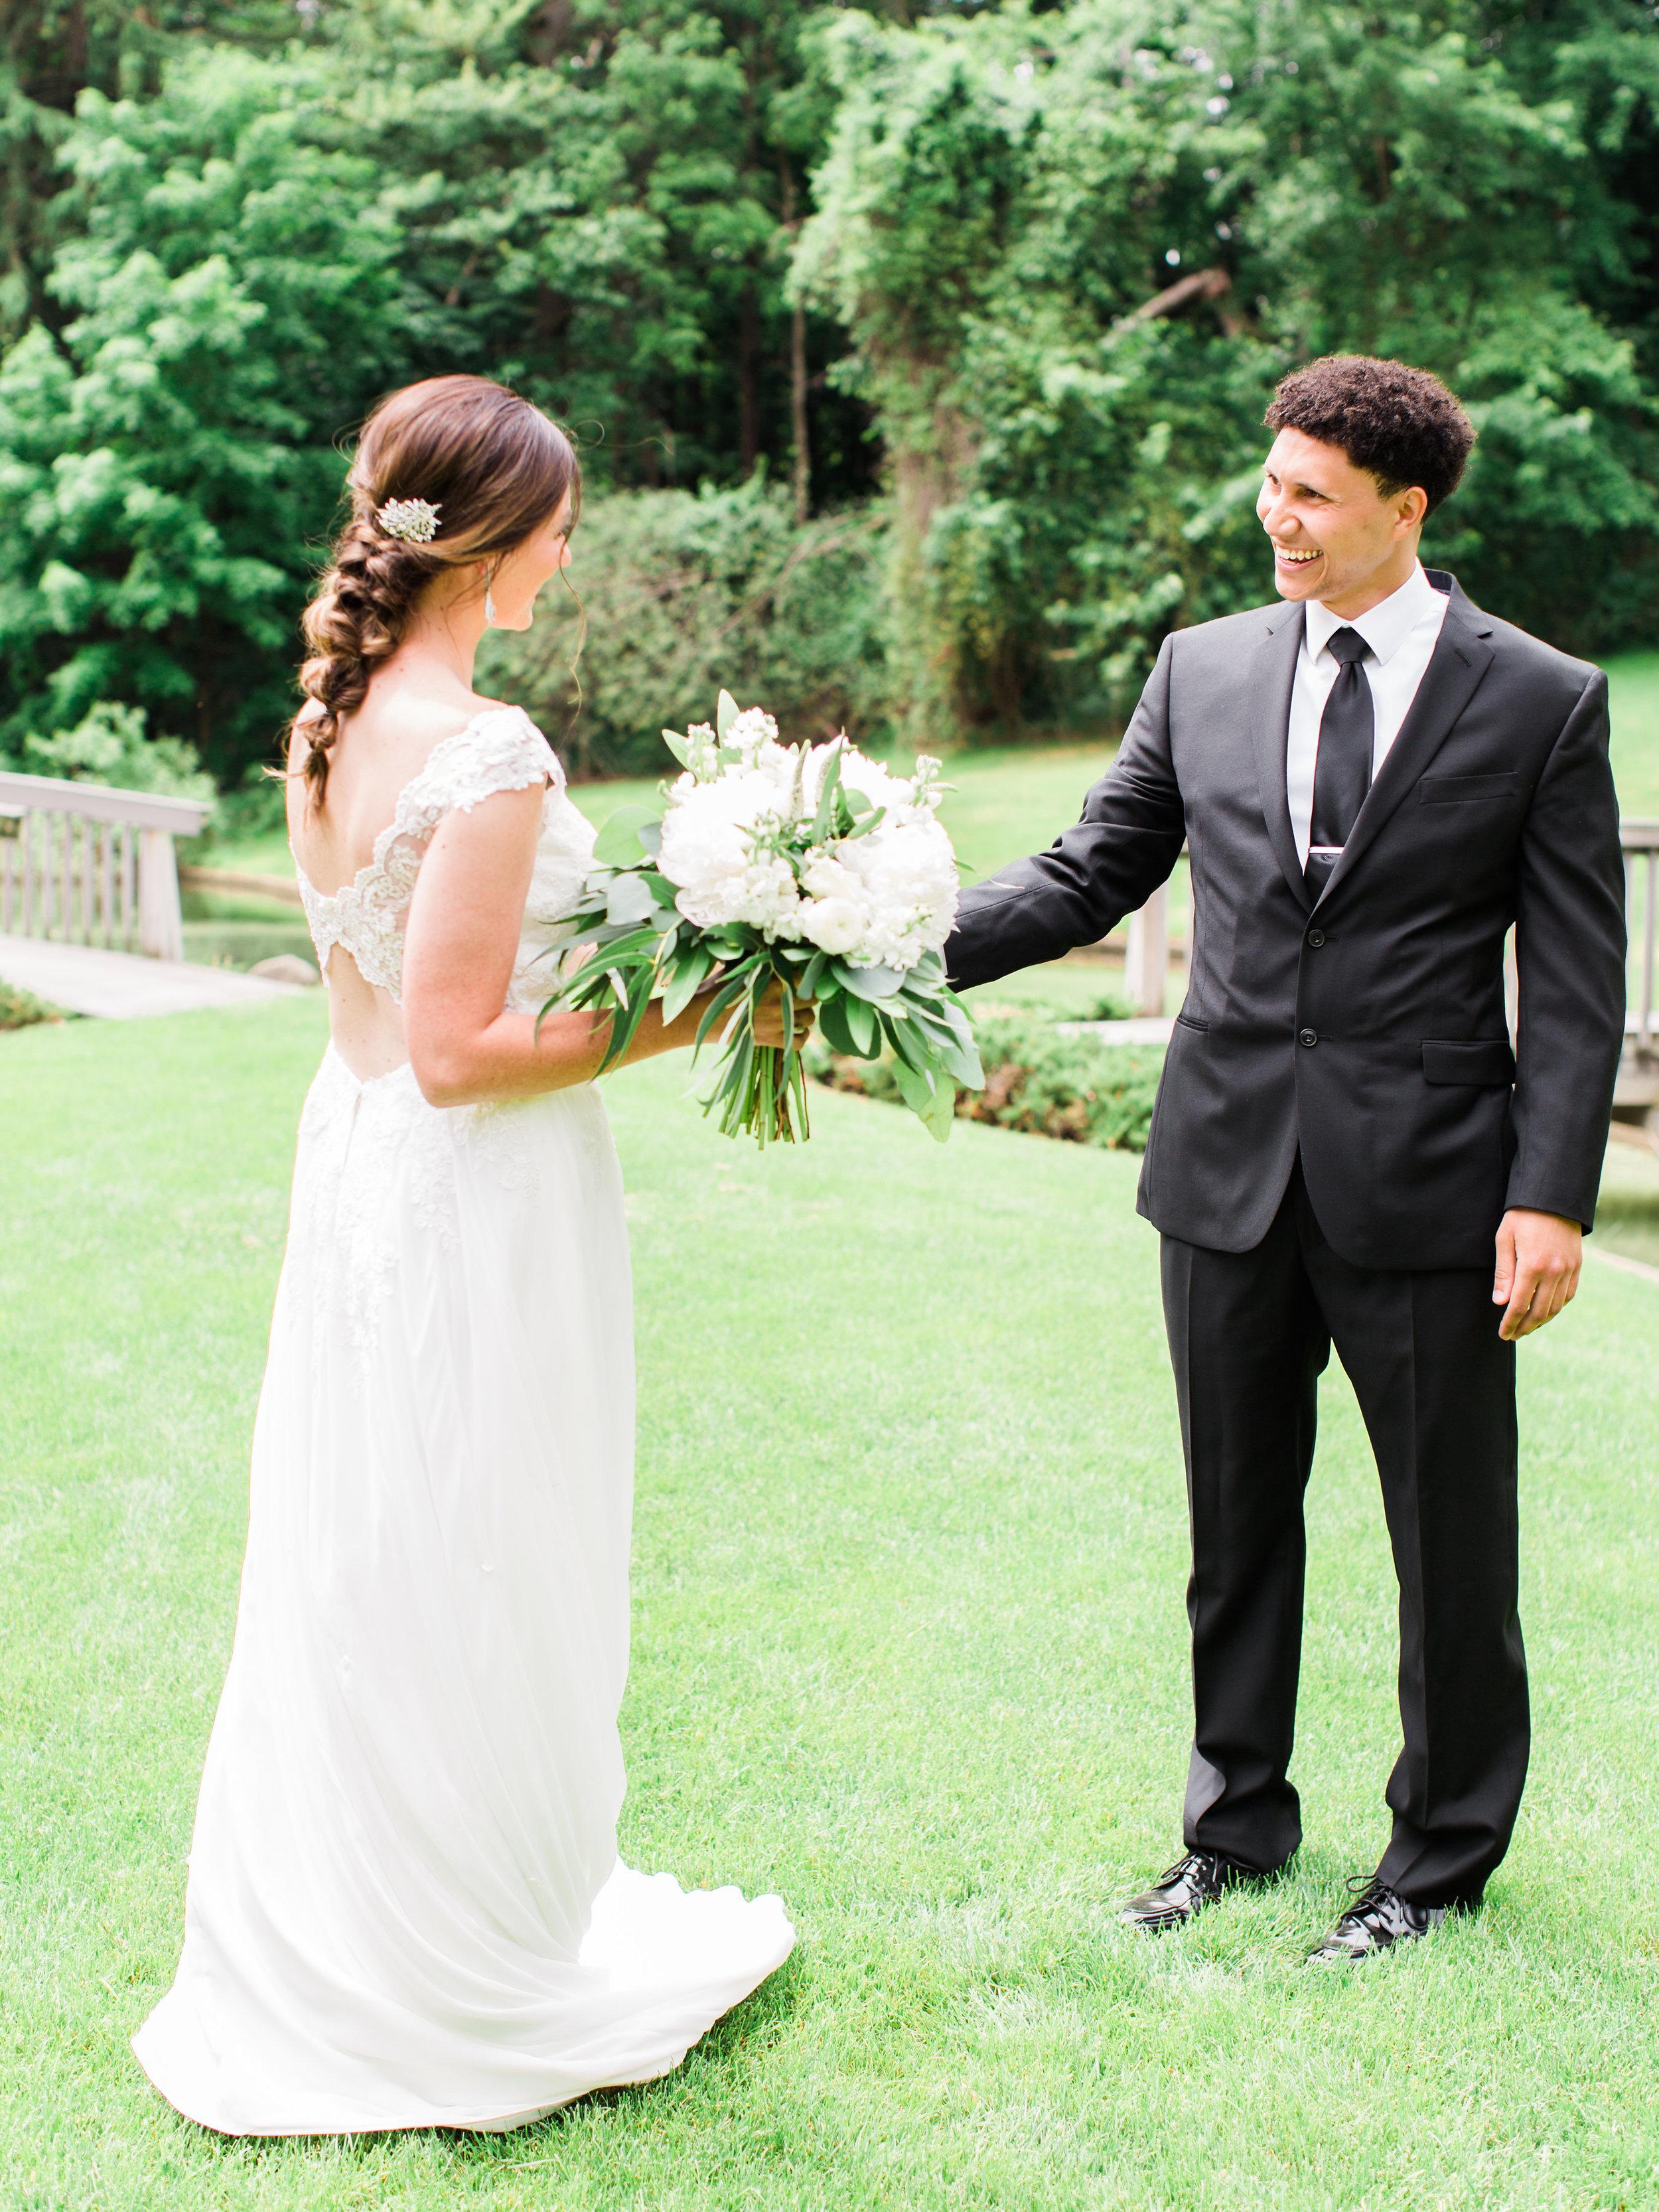 Julius+Wedding+FirstLook-13.jpg